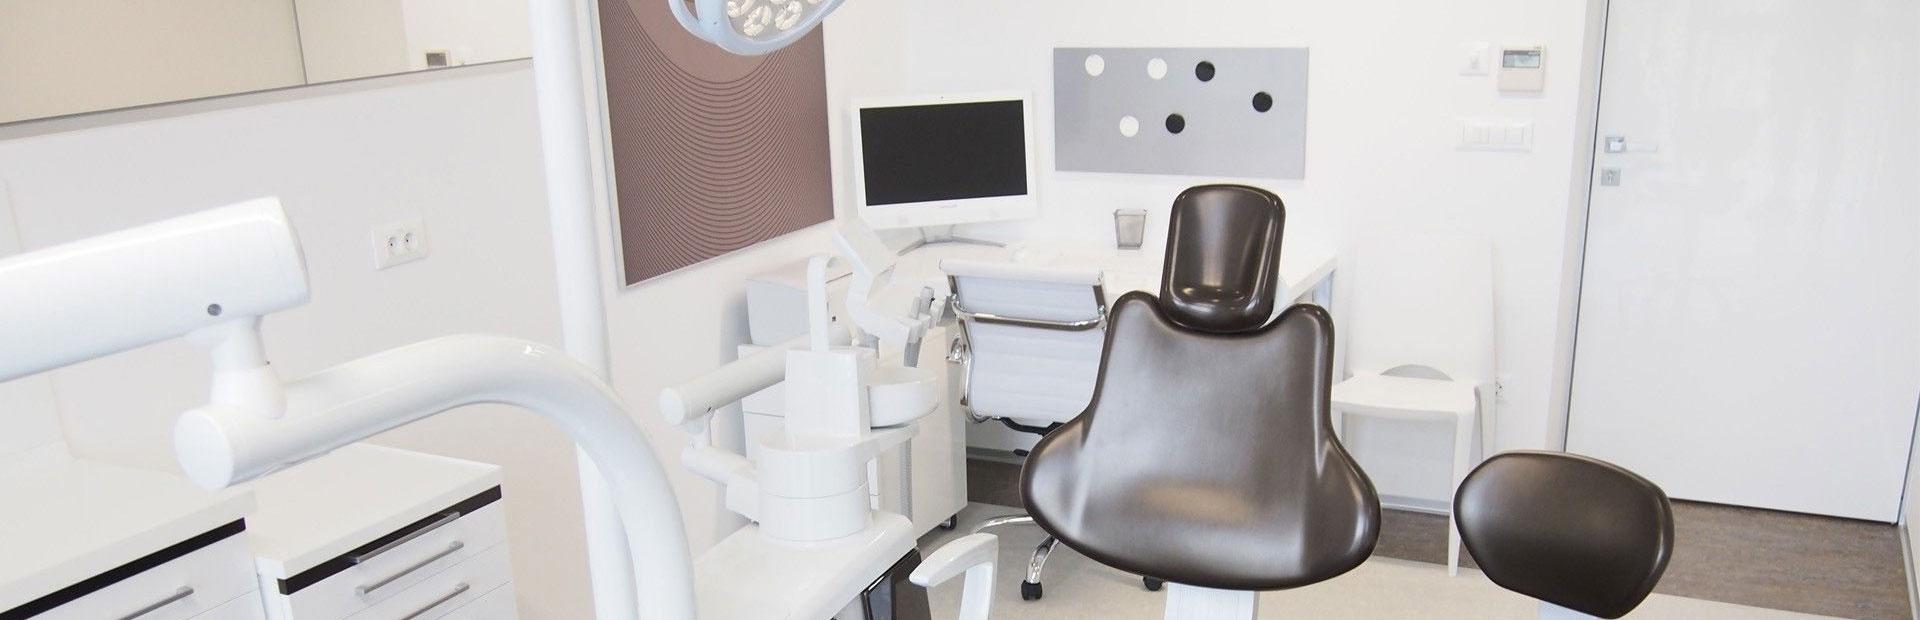 Stomatološka ordinacija Zagreb | Štimac Centar dentalne medicine